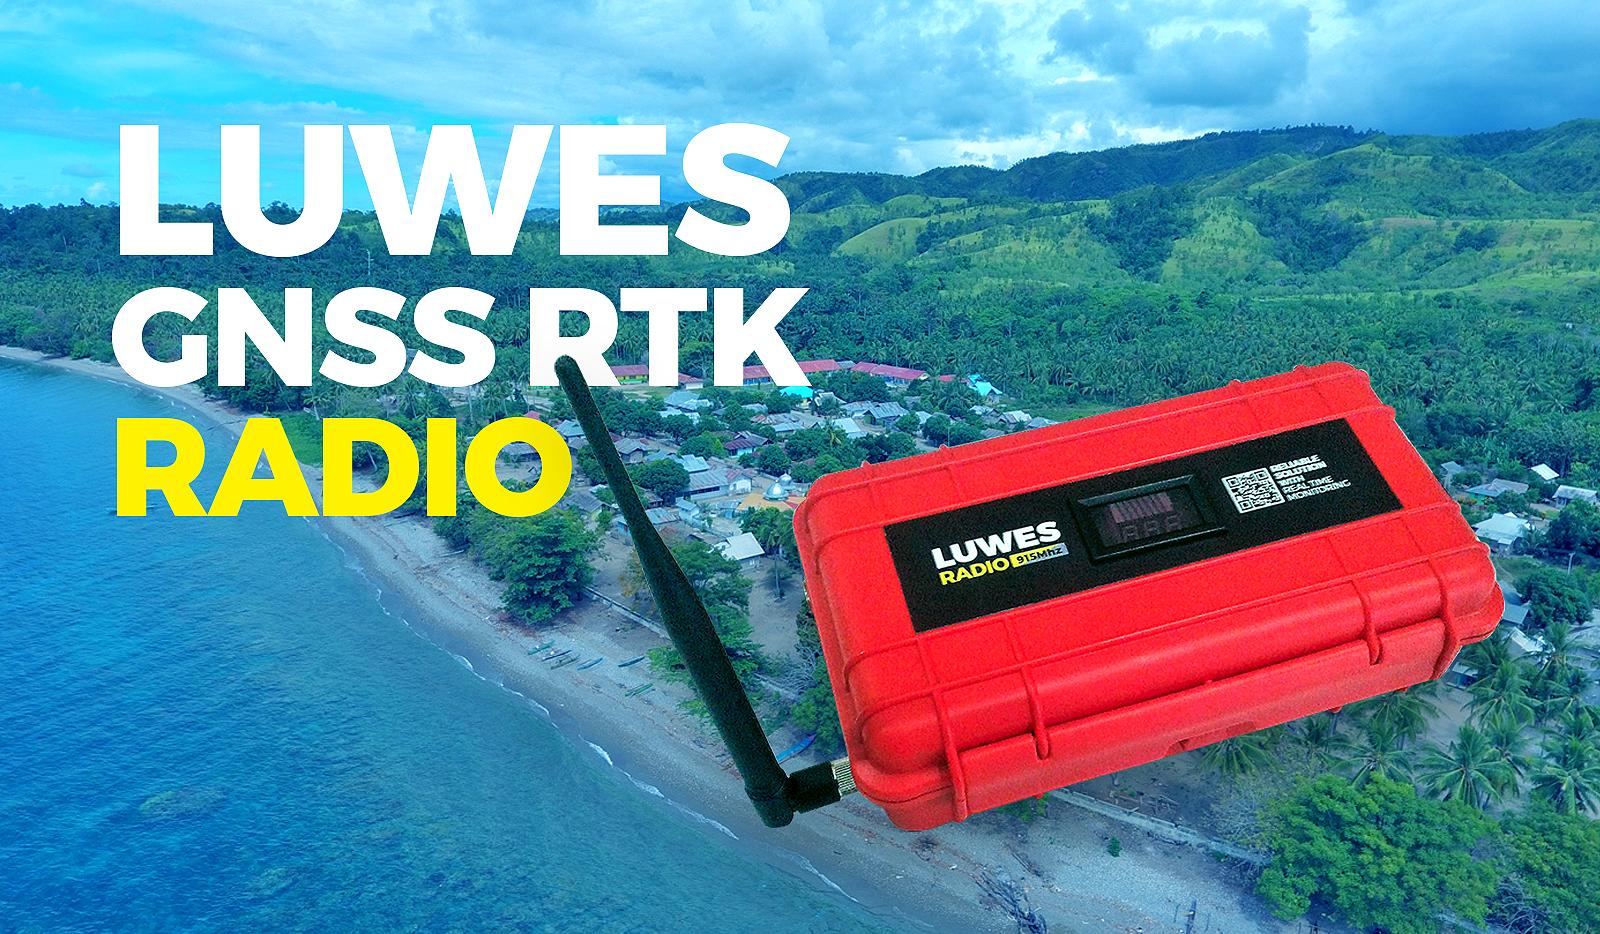 LUWES GNSS RTK Radio, Handal untuk Lokasi Terpencil